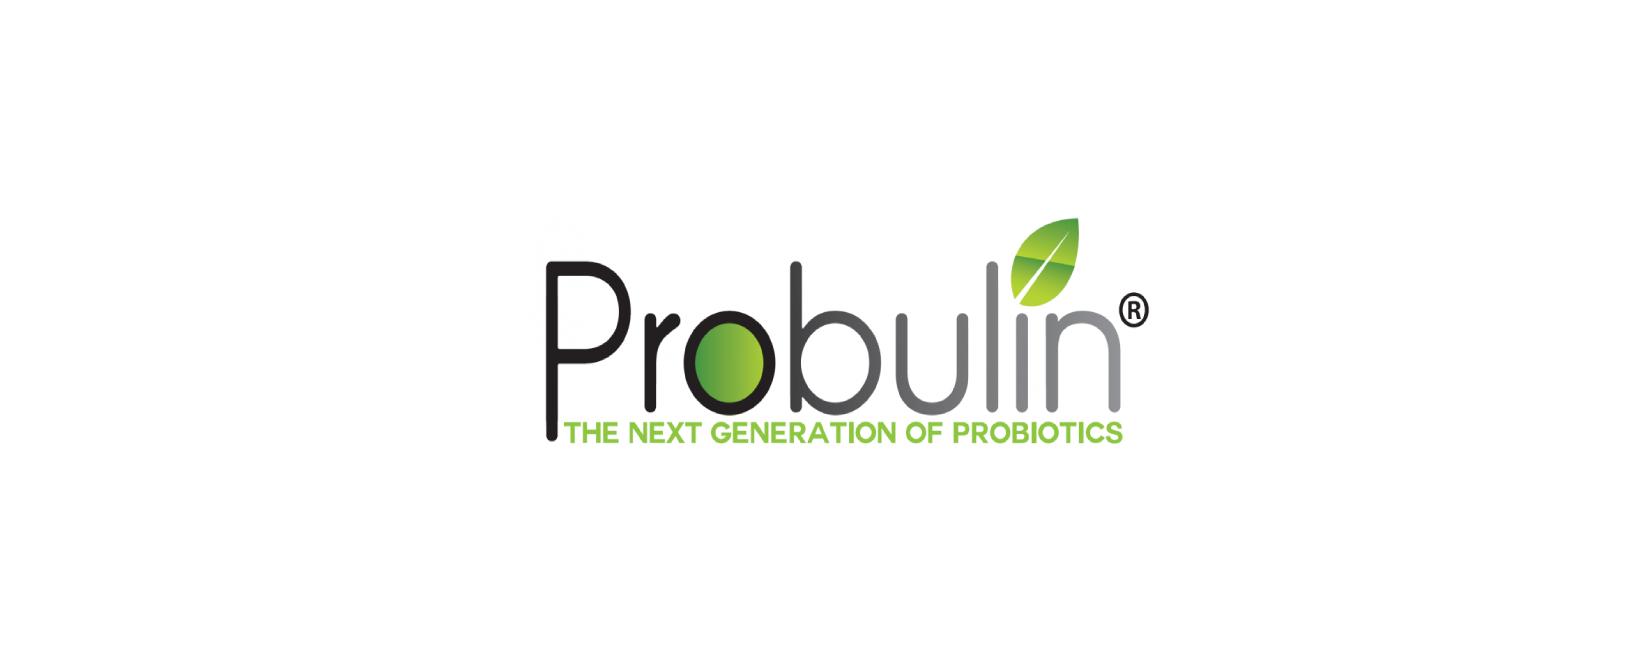 Probulin Coupon Code 2021